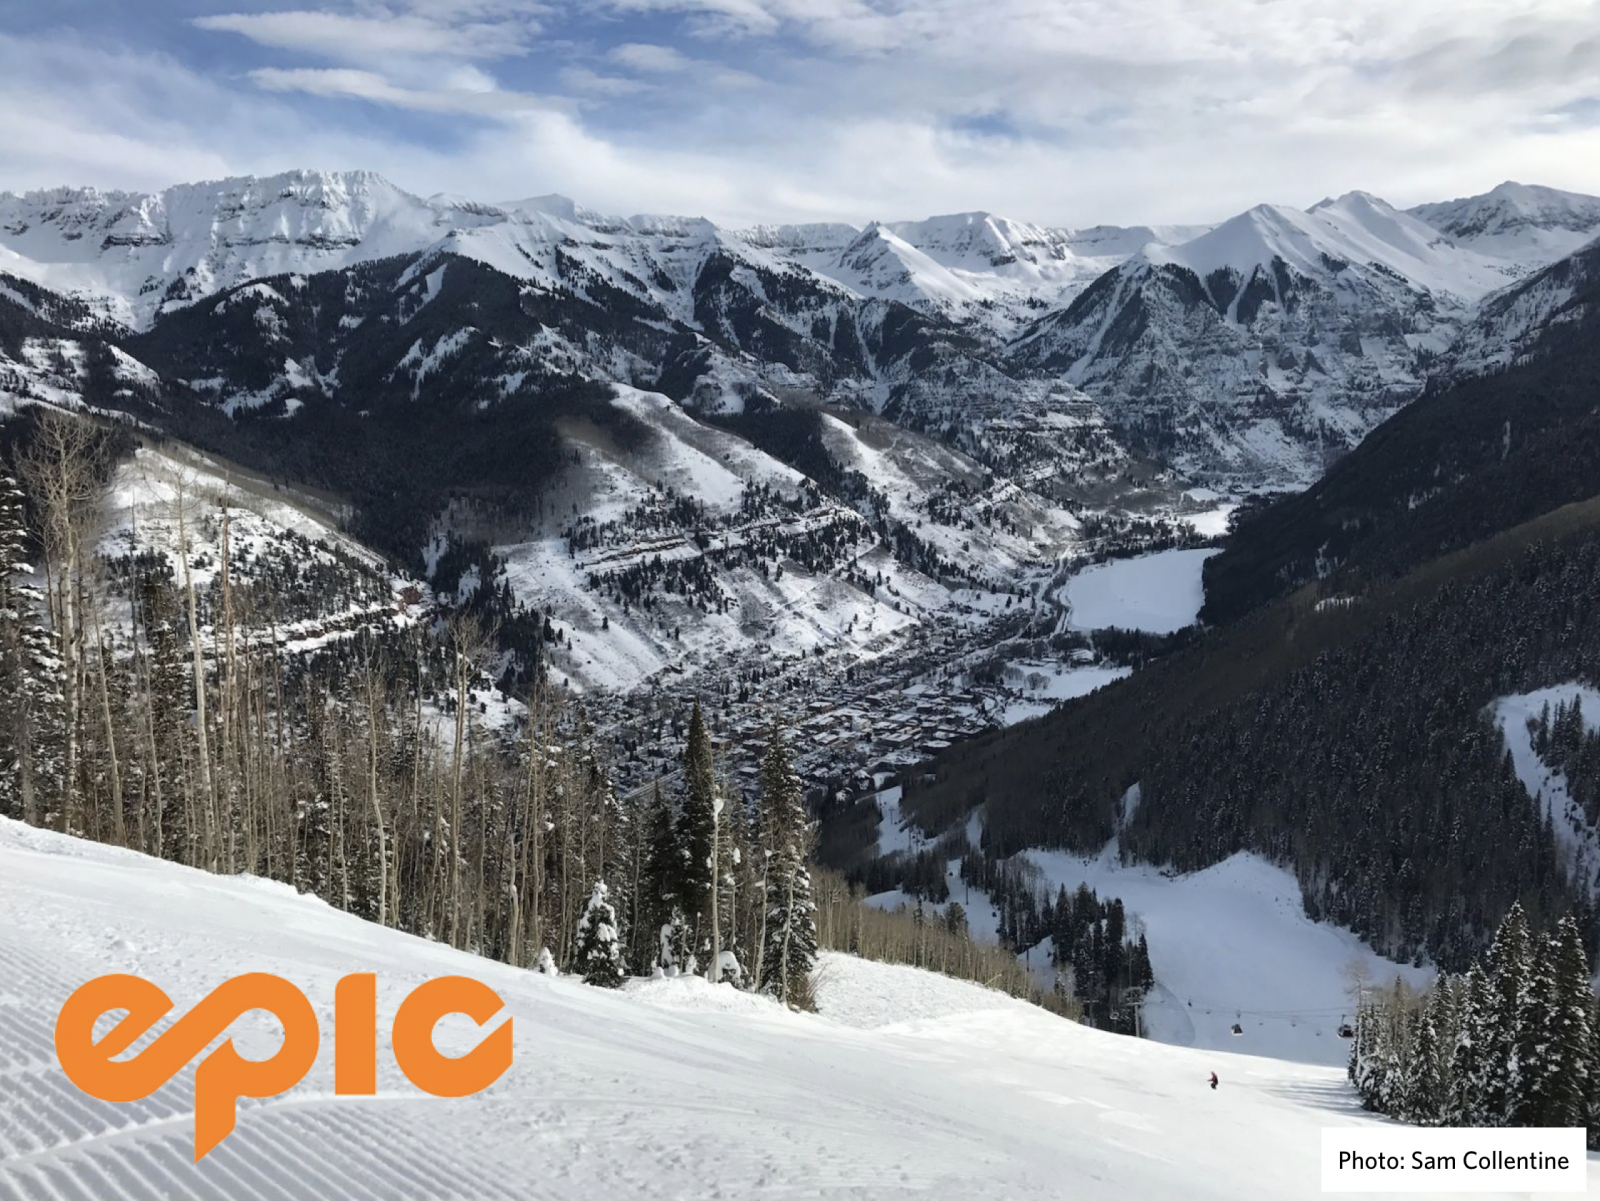 the epic pass adds telluride ski resort | opensnow